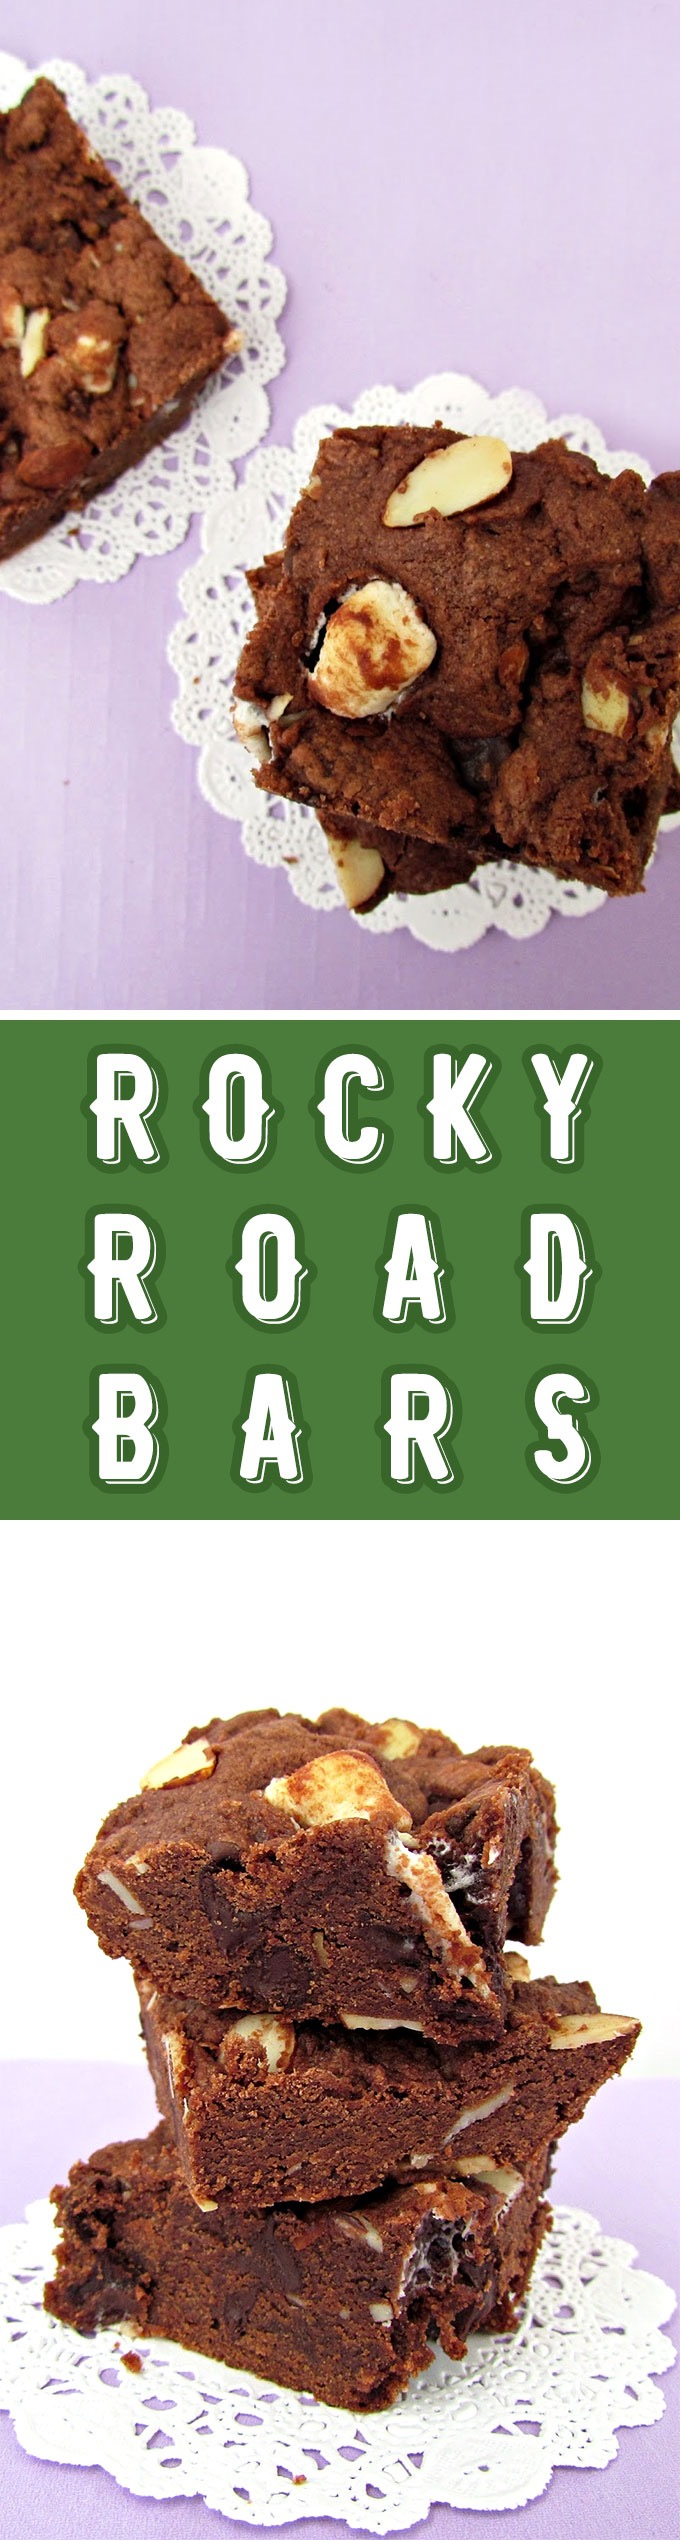 Rocky Road Dessert Bars Recipe on Sweet2EatBaking.com